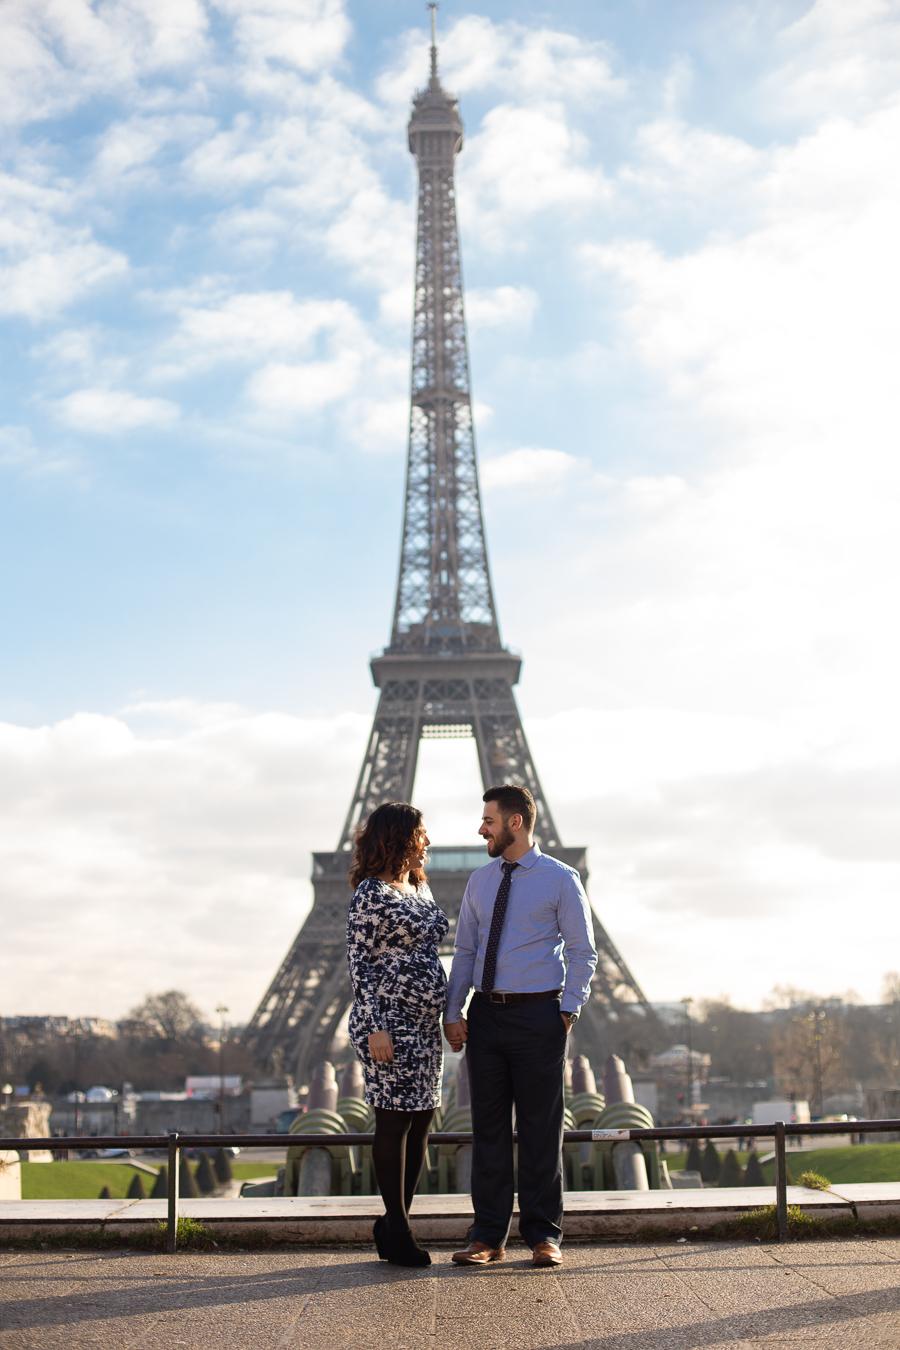 Paris Ile de France Maternity Photographer, Photographe Grossesse_009.jpg